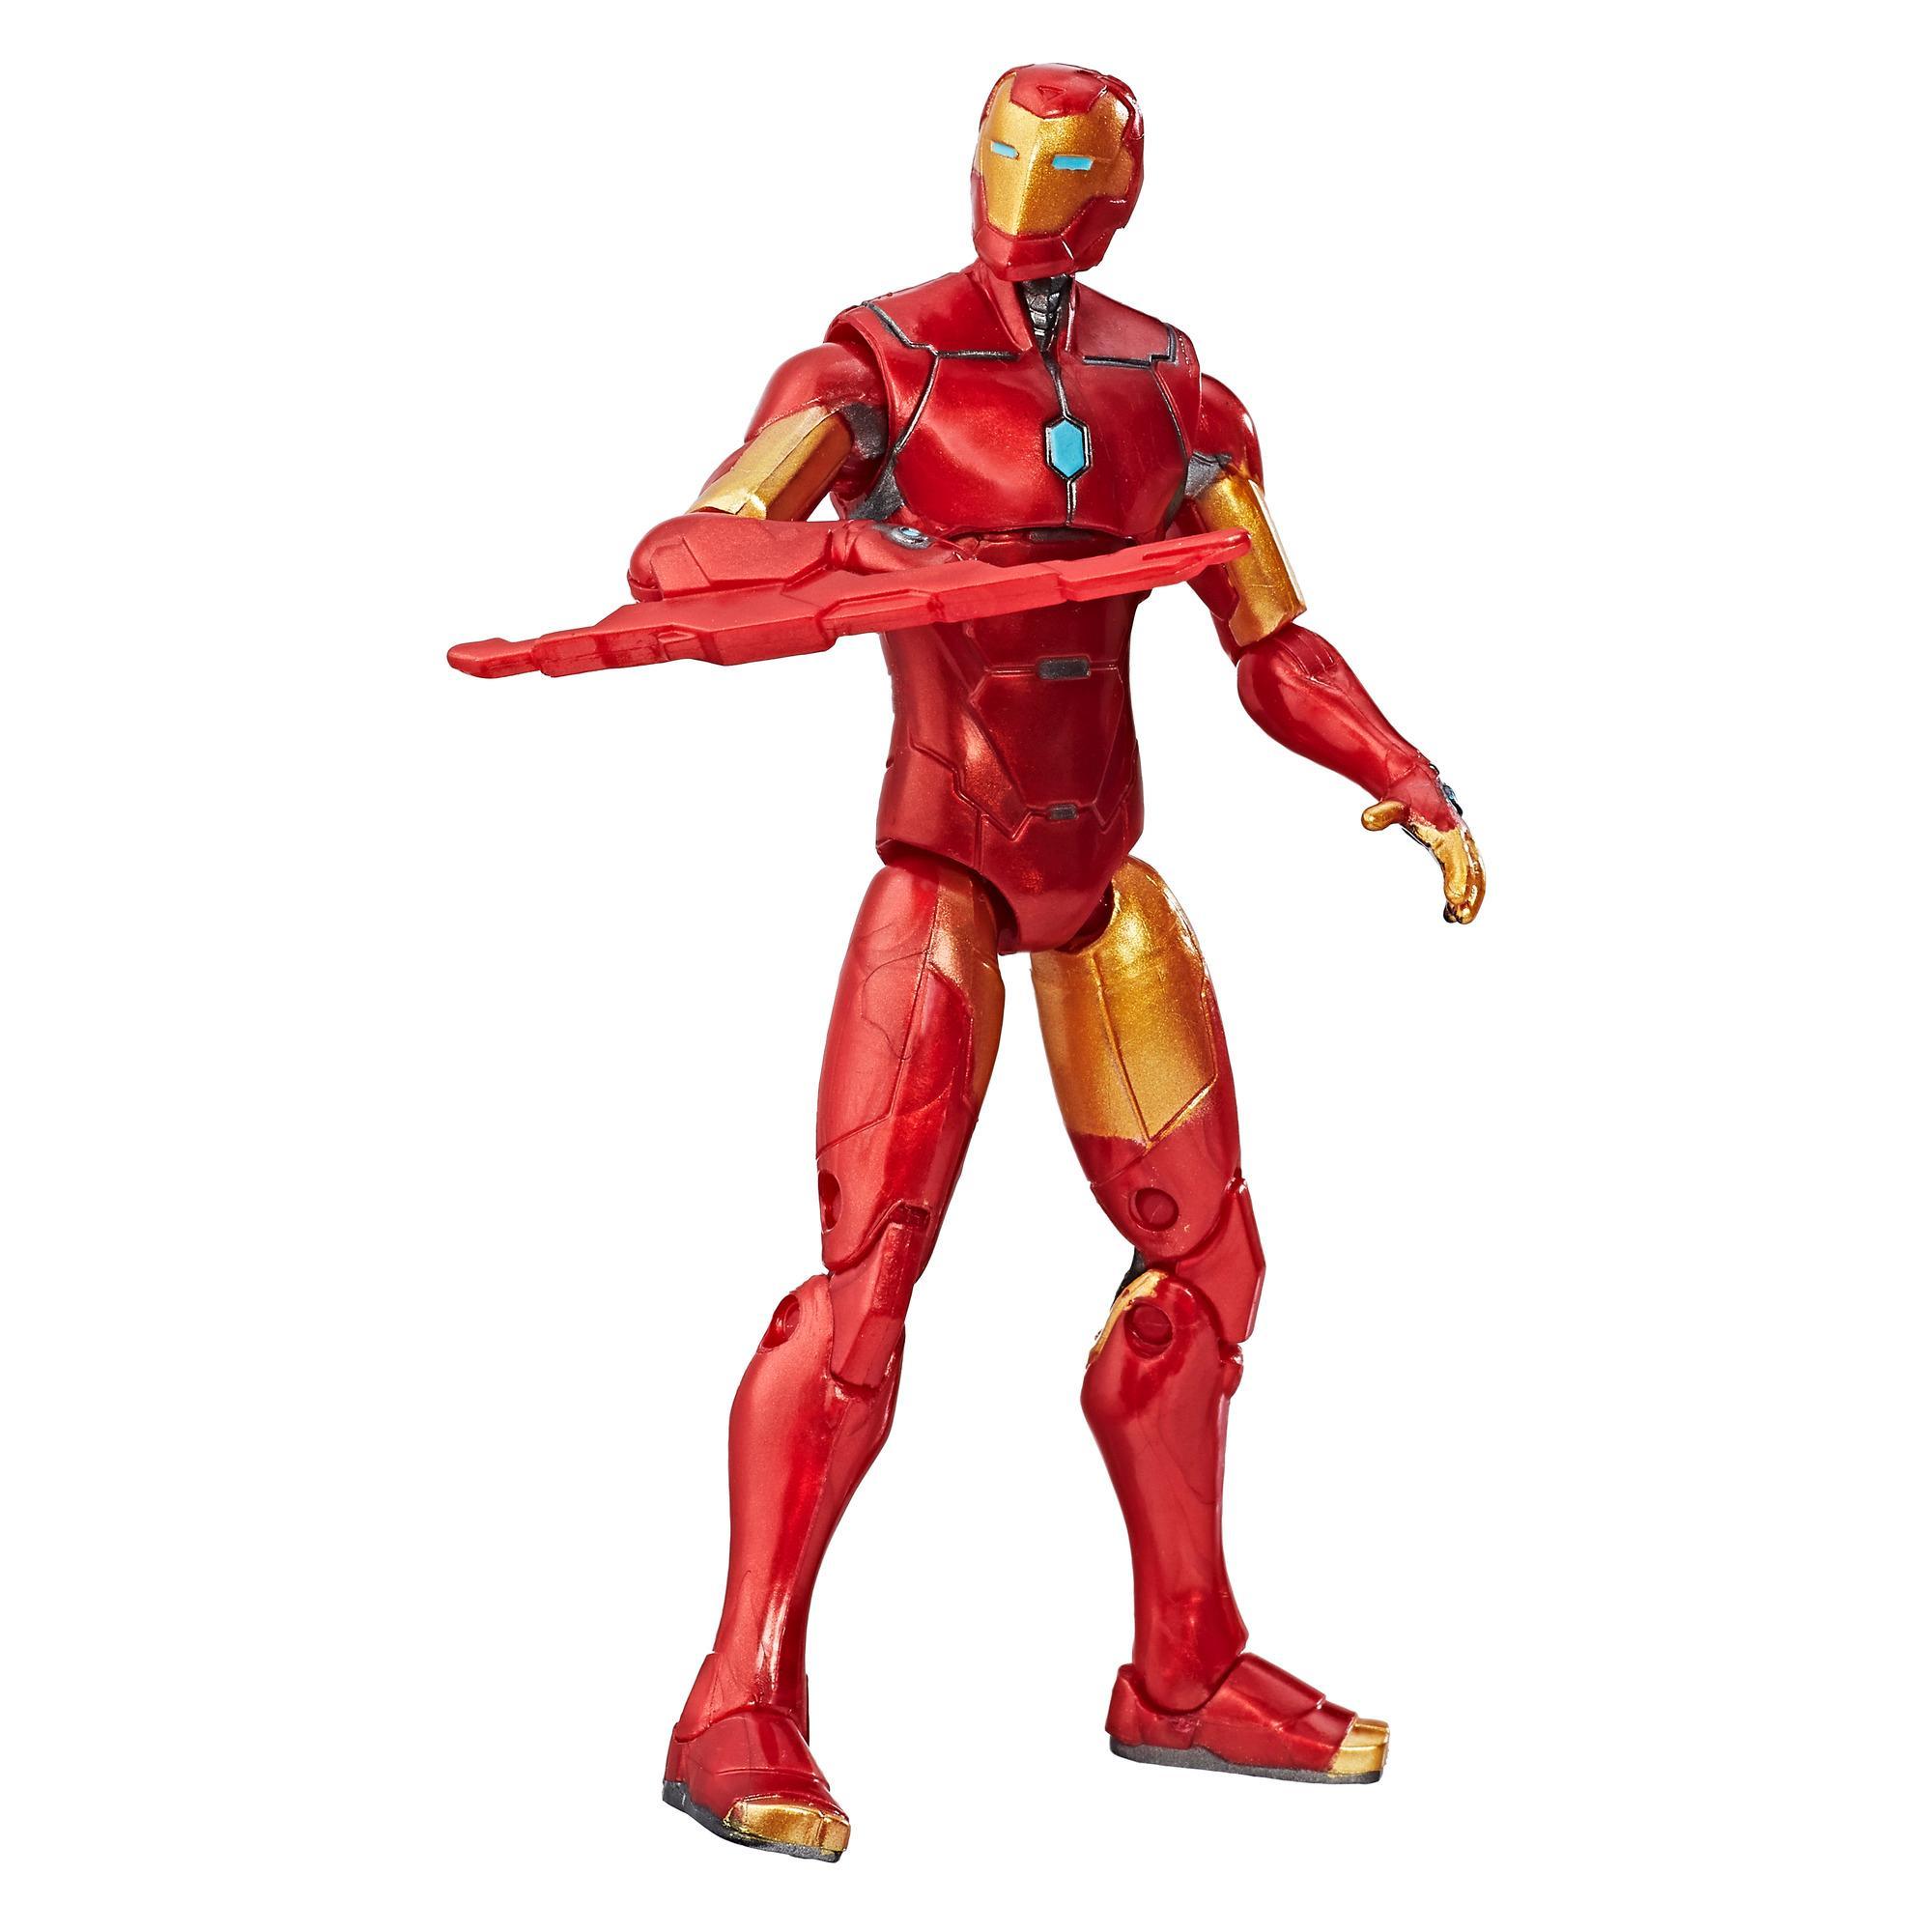 Marvel Legends Series - Figurine Invincible Iron Man de 9 cm